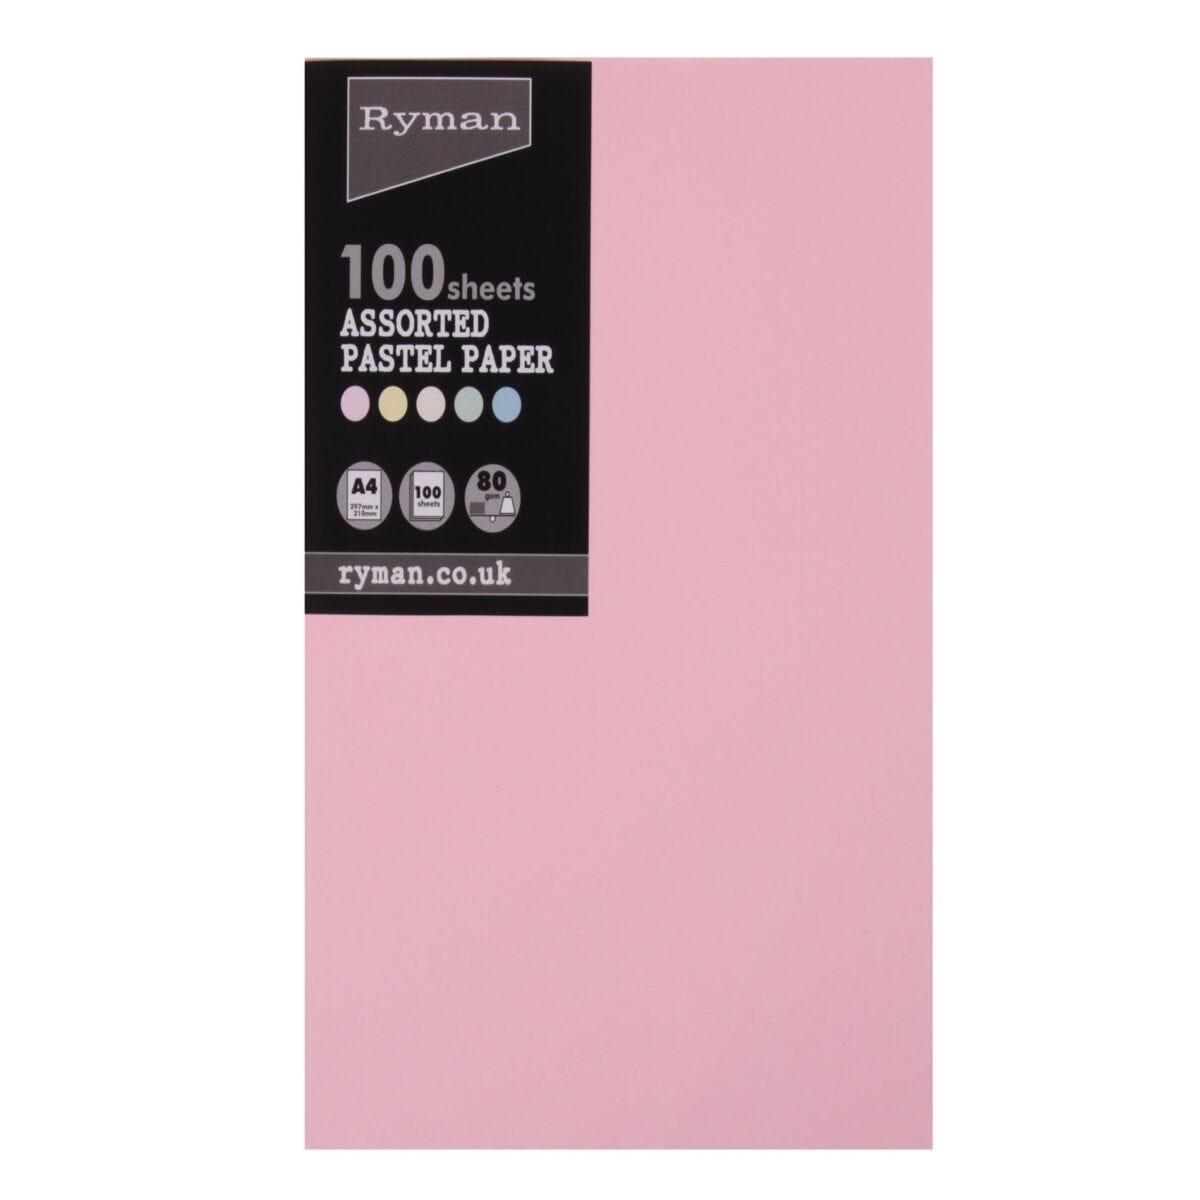 Ryman Copy Paper Coloured A4 80gsm 100 Sheets